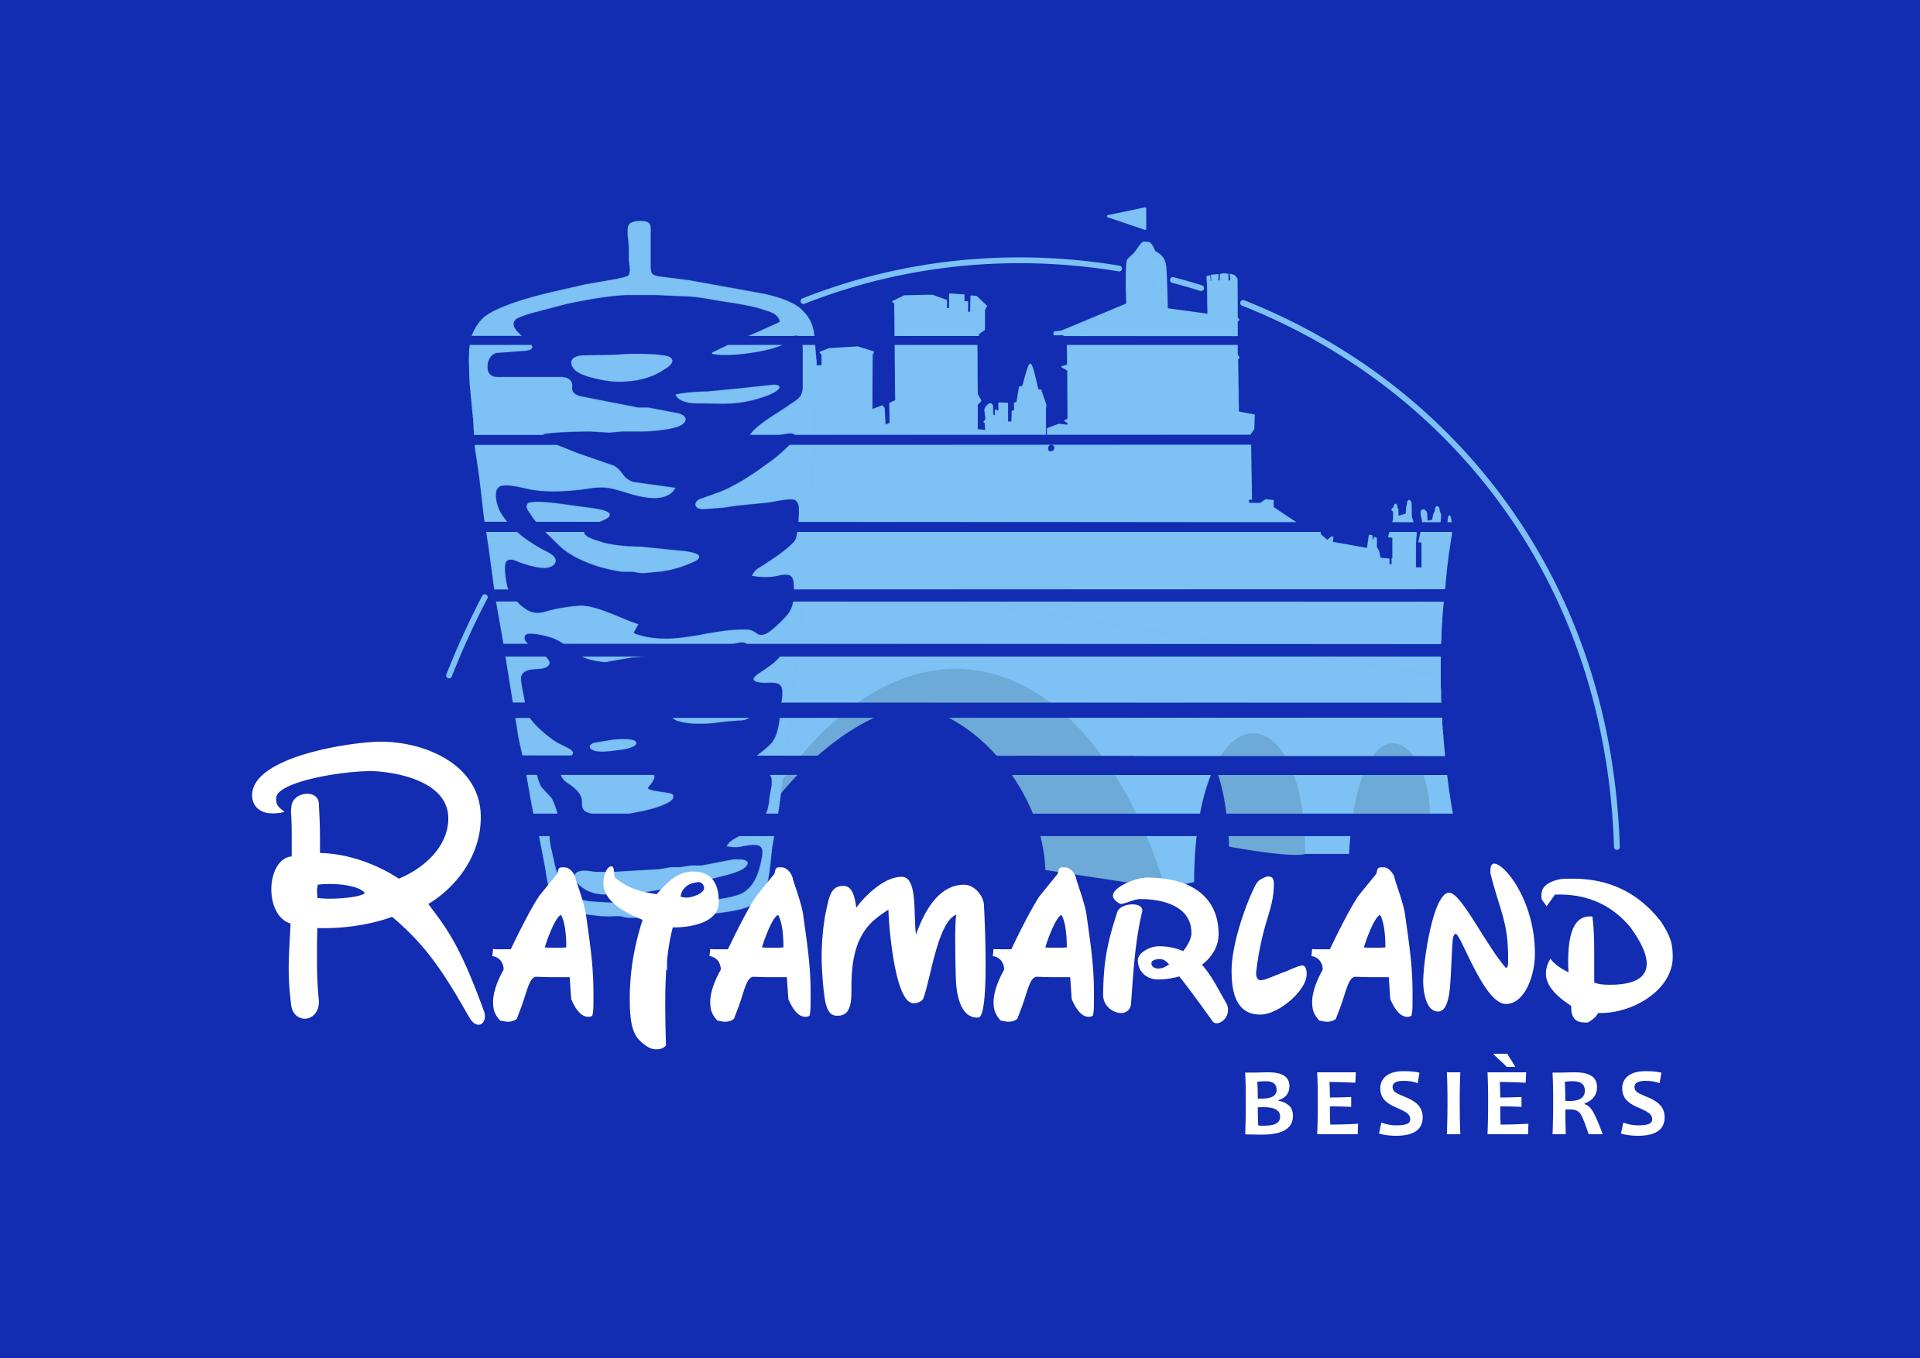 Ratamarland